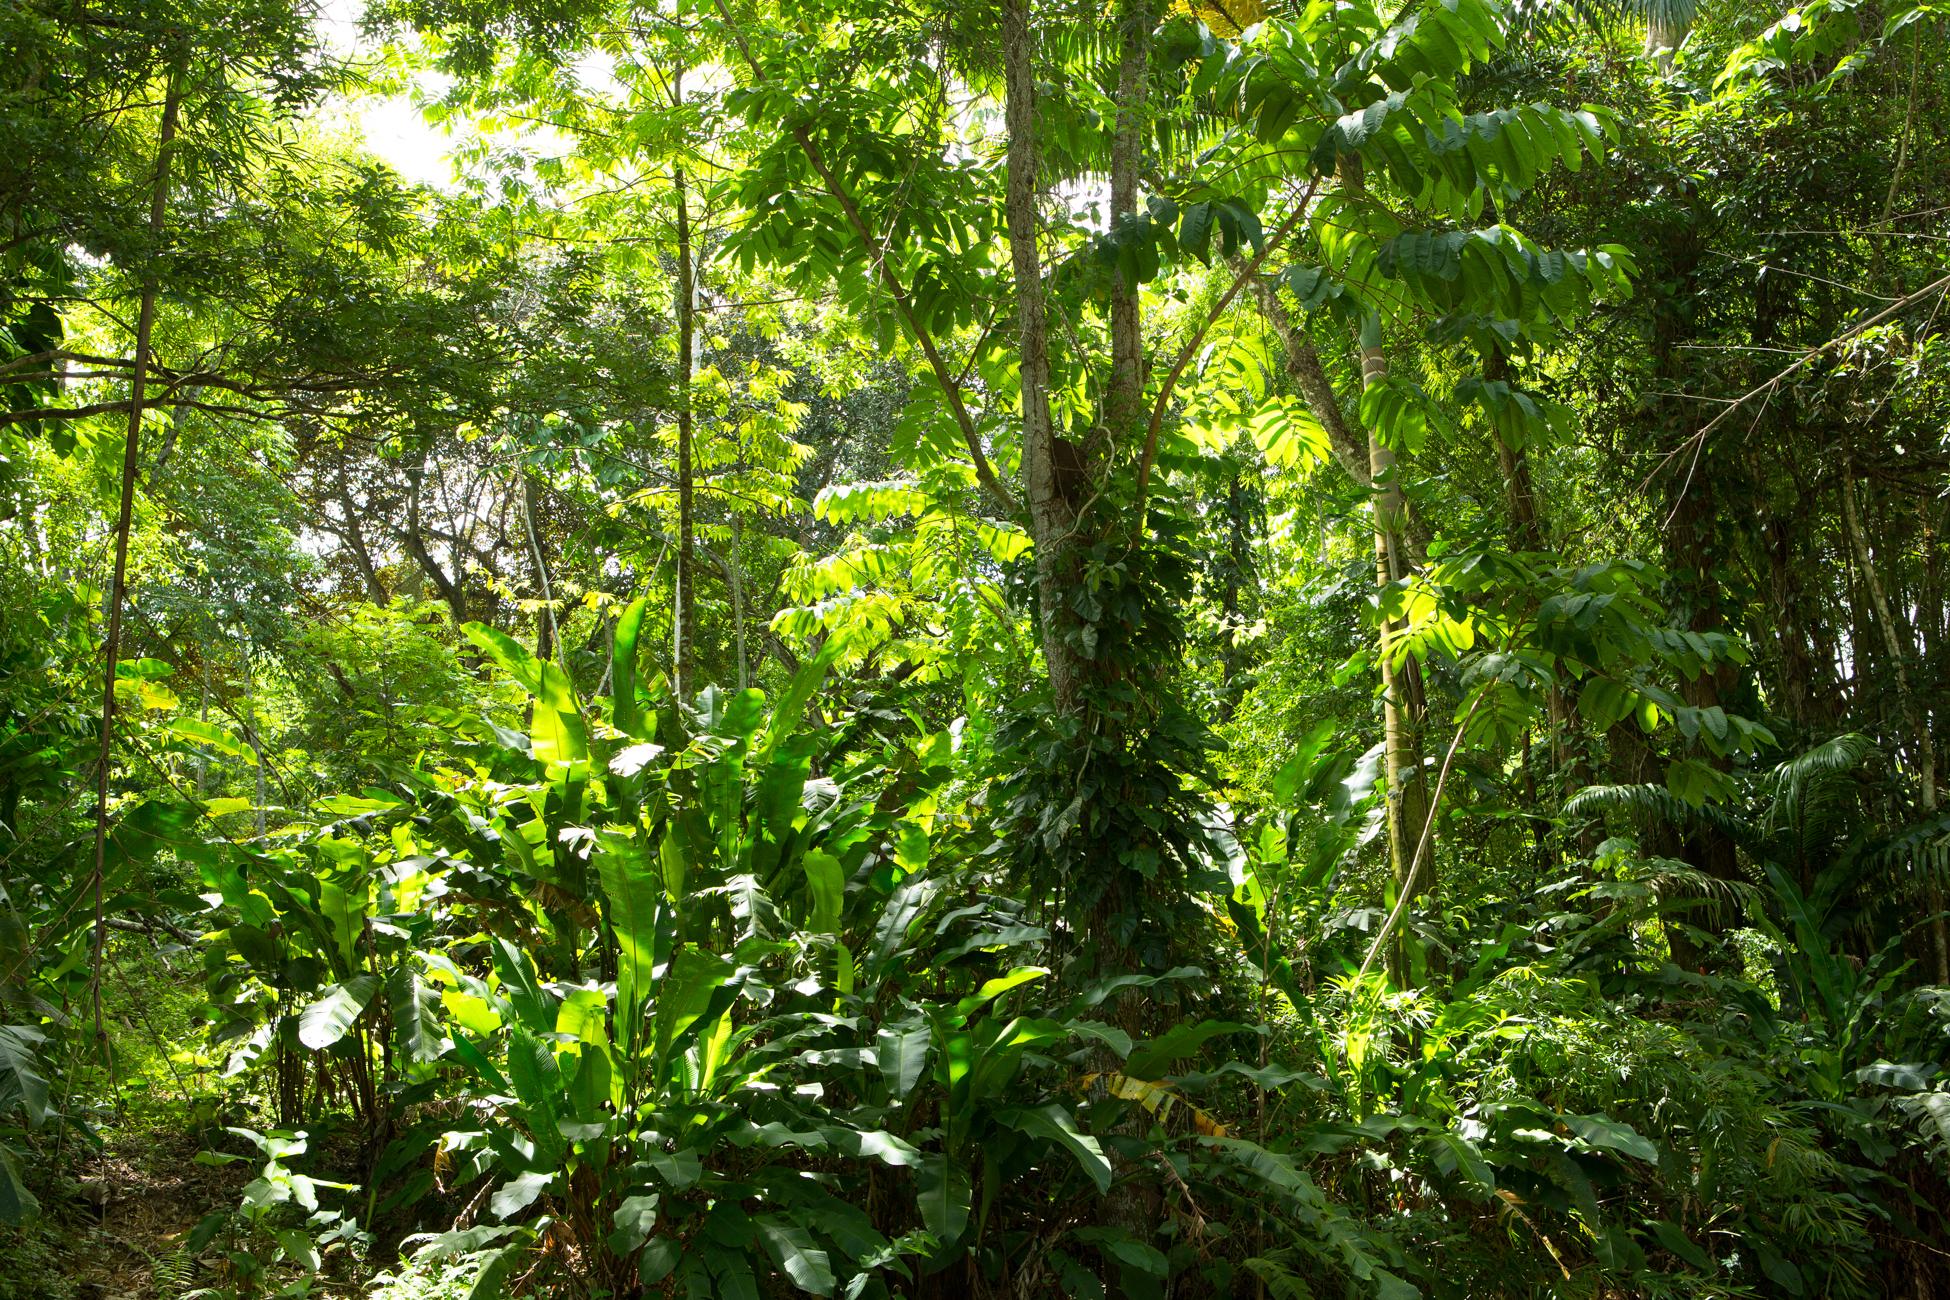 Jungle I, 2013 //  80 cm x 120 cm